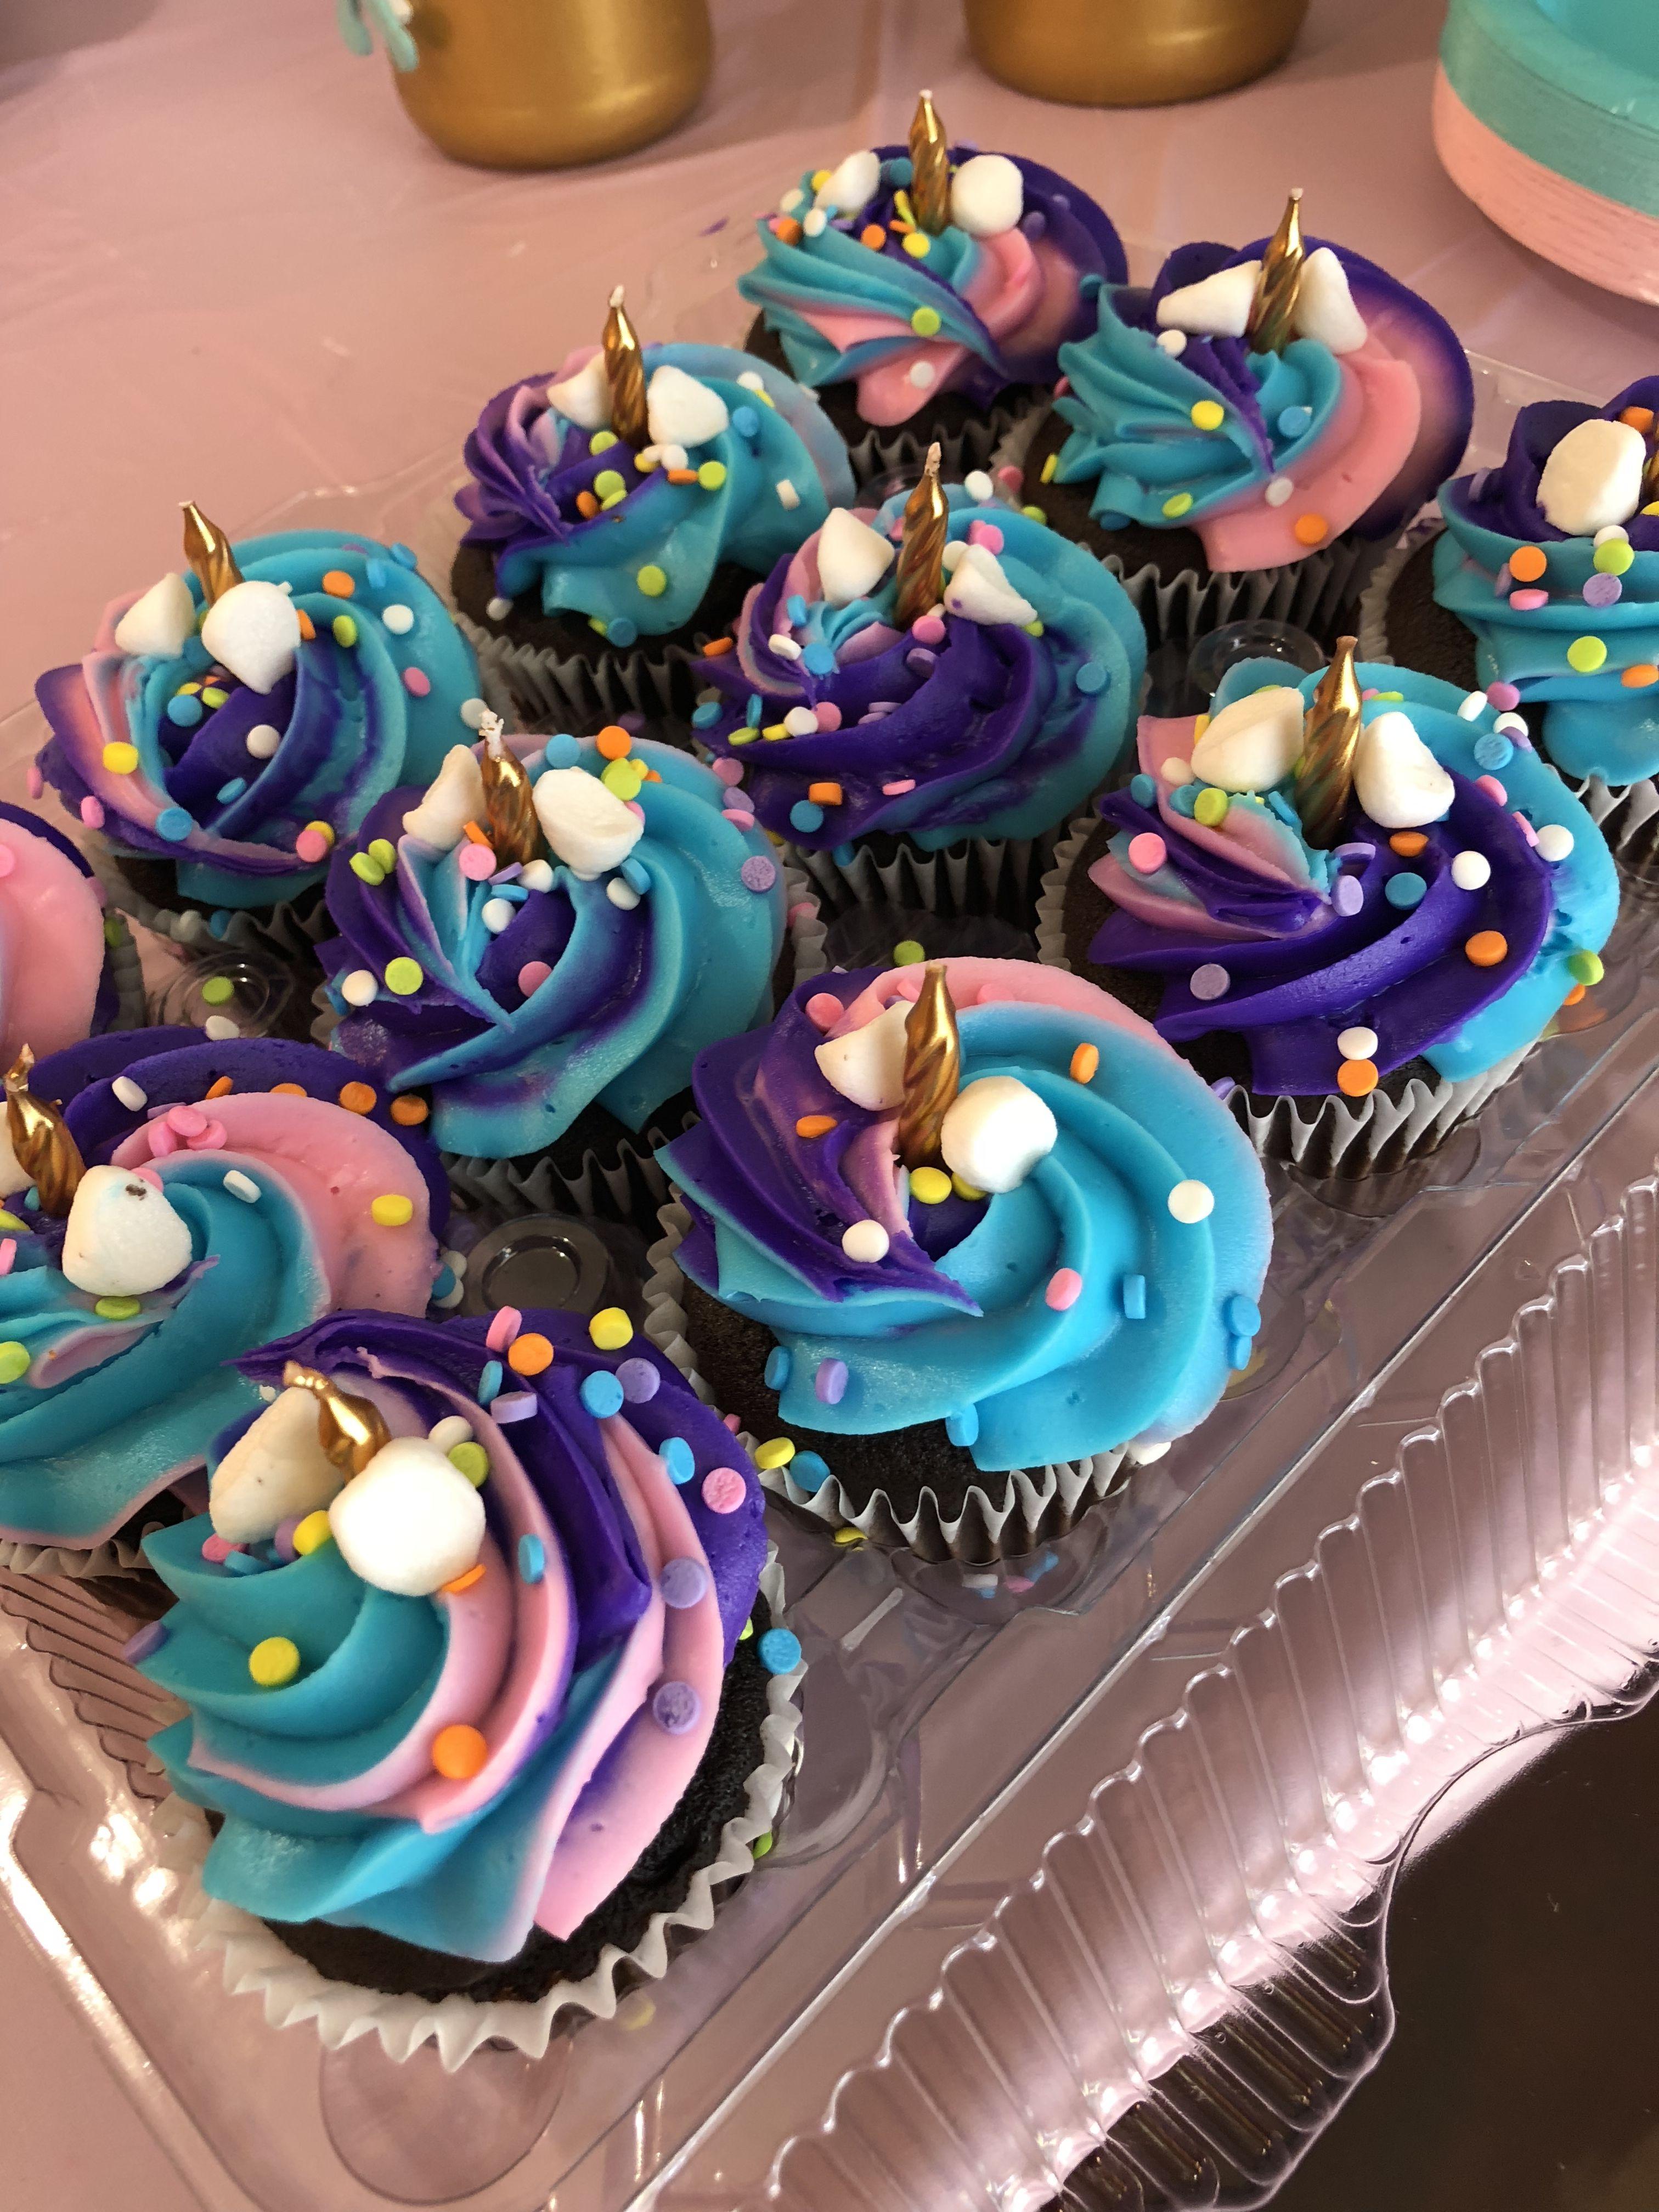 Heb Cakes Custom : cakes, custom, Unicorn, Cupcakes, Ordered, H-E-B, Cupcakes,, Desserts,, H-e-b